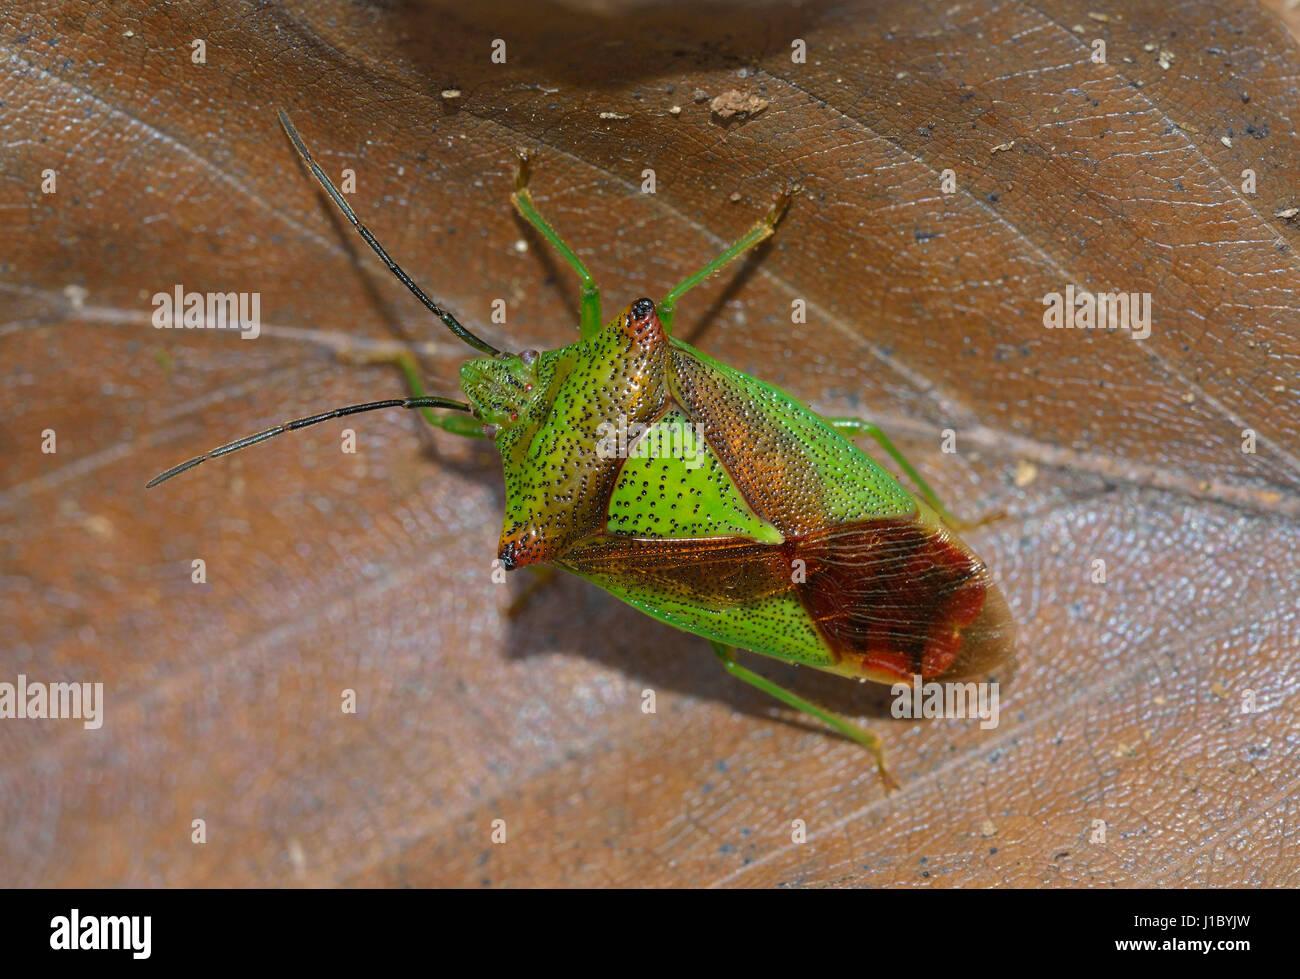 Hawthorn Shieldbug - Acanthosoma haemorrhoidale Adult on Beech Leaf Litter Stock Photo